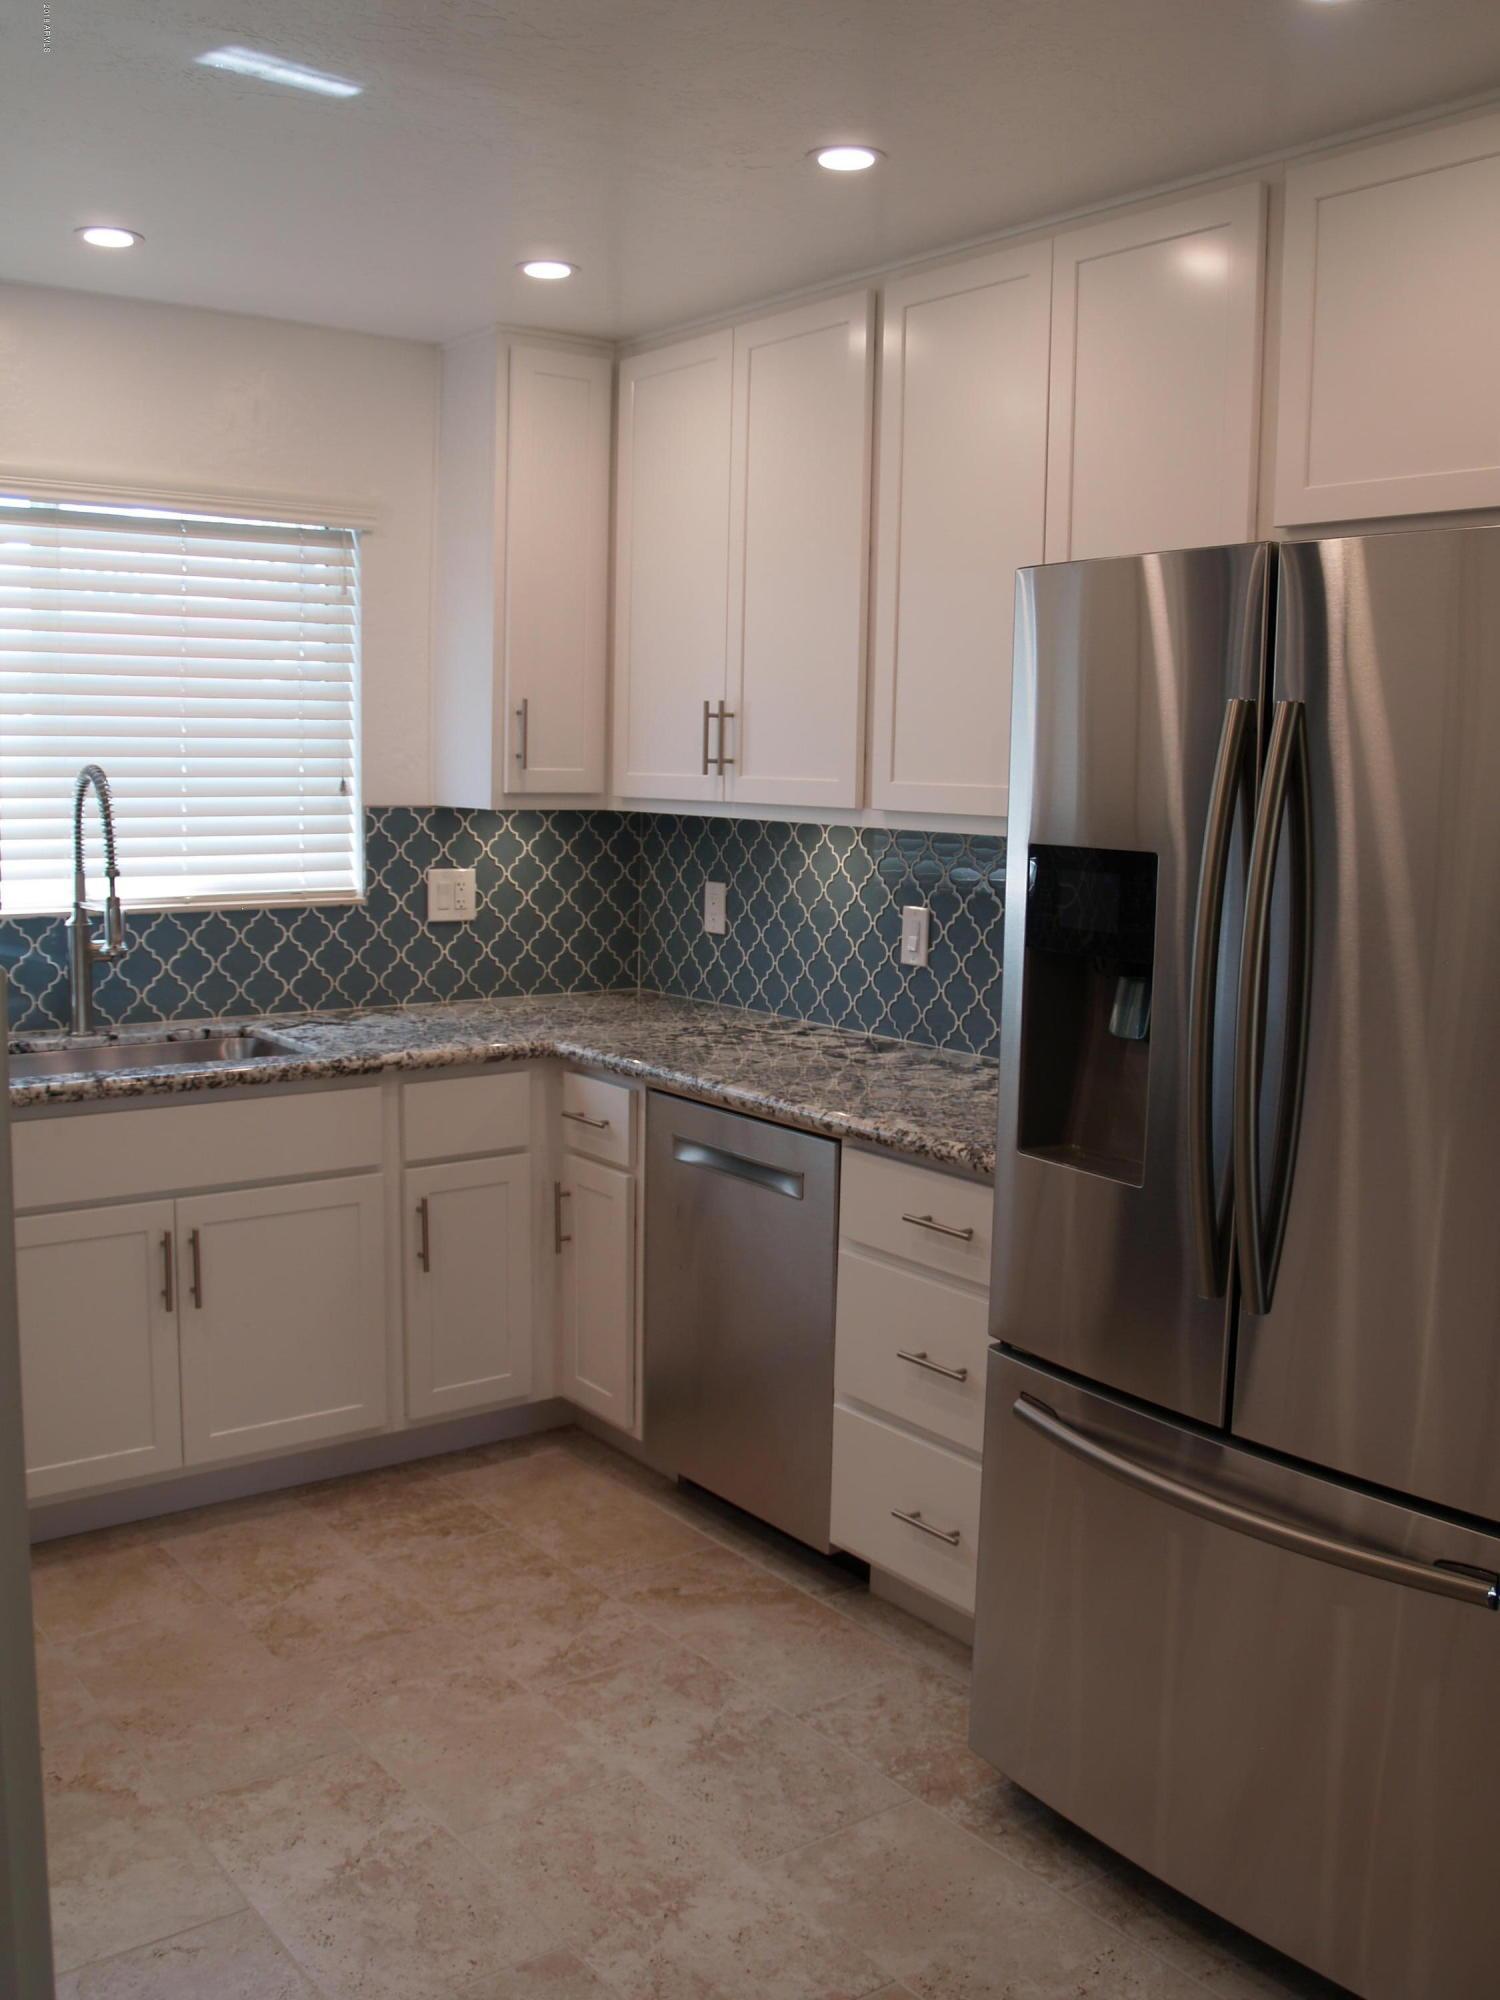 MLS 5767305 4609 N Miller Road, Scottsdale, AZ 85251 Scottsdale AZ Spec Home